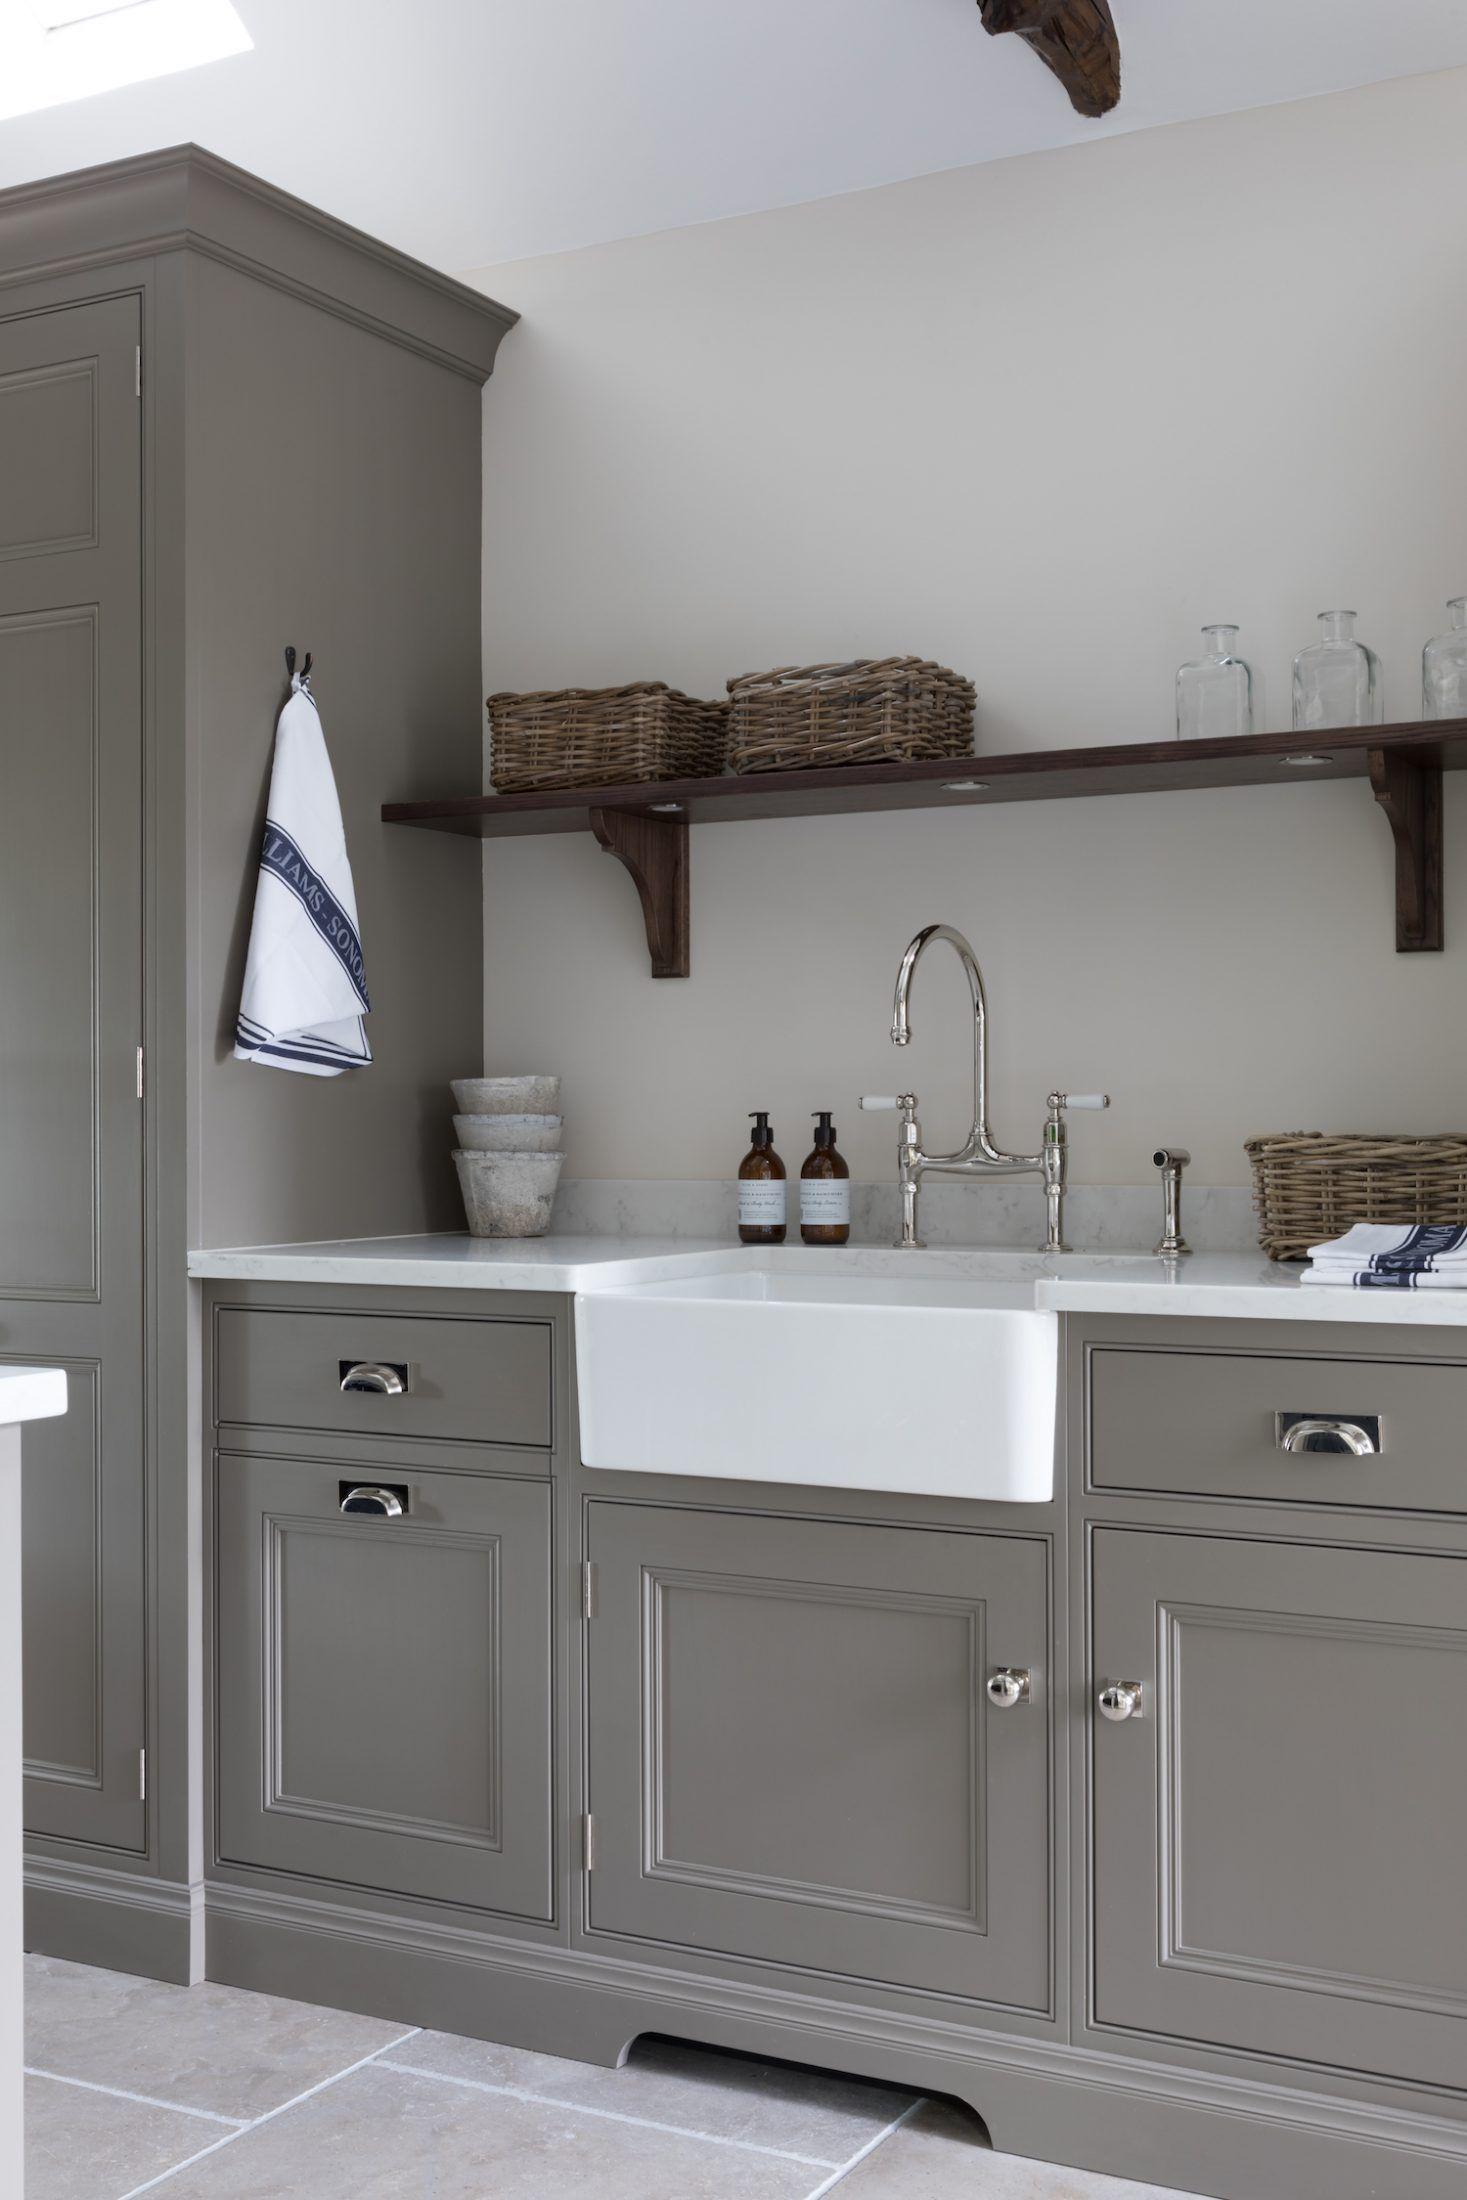 Classic Contemporary Kitchen Project Sevenoaks Kent Humphrey Munson Kitchens Kitchen Design Utility Room Designs Kitchen Remodel